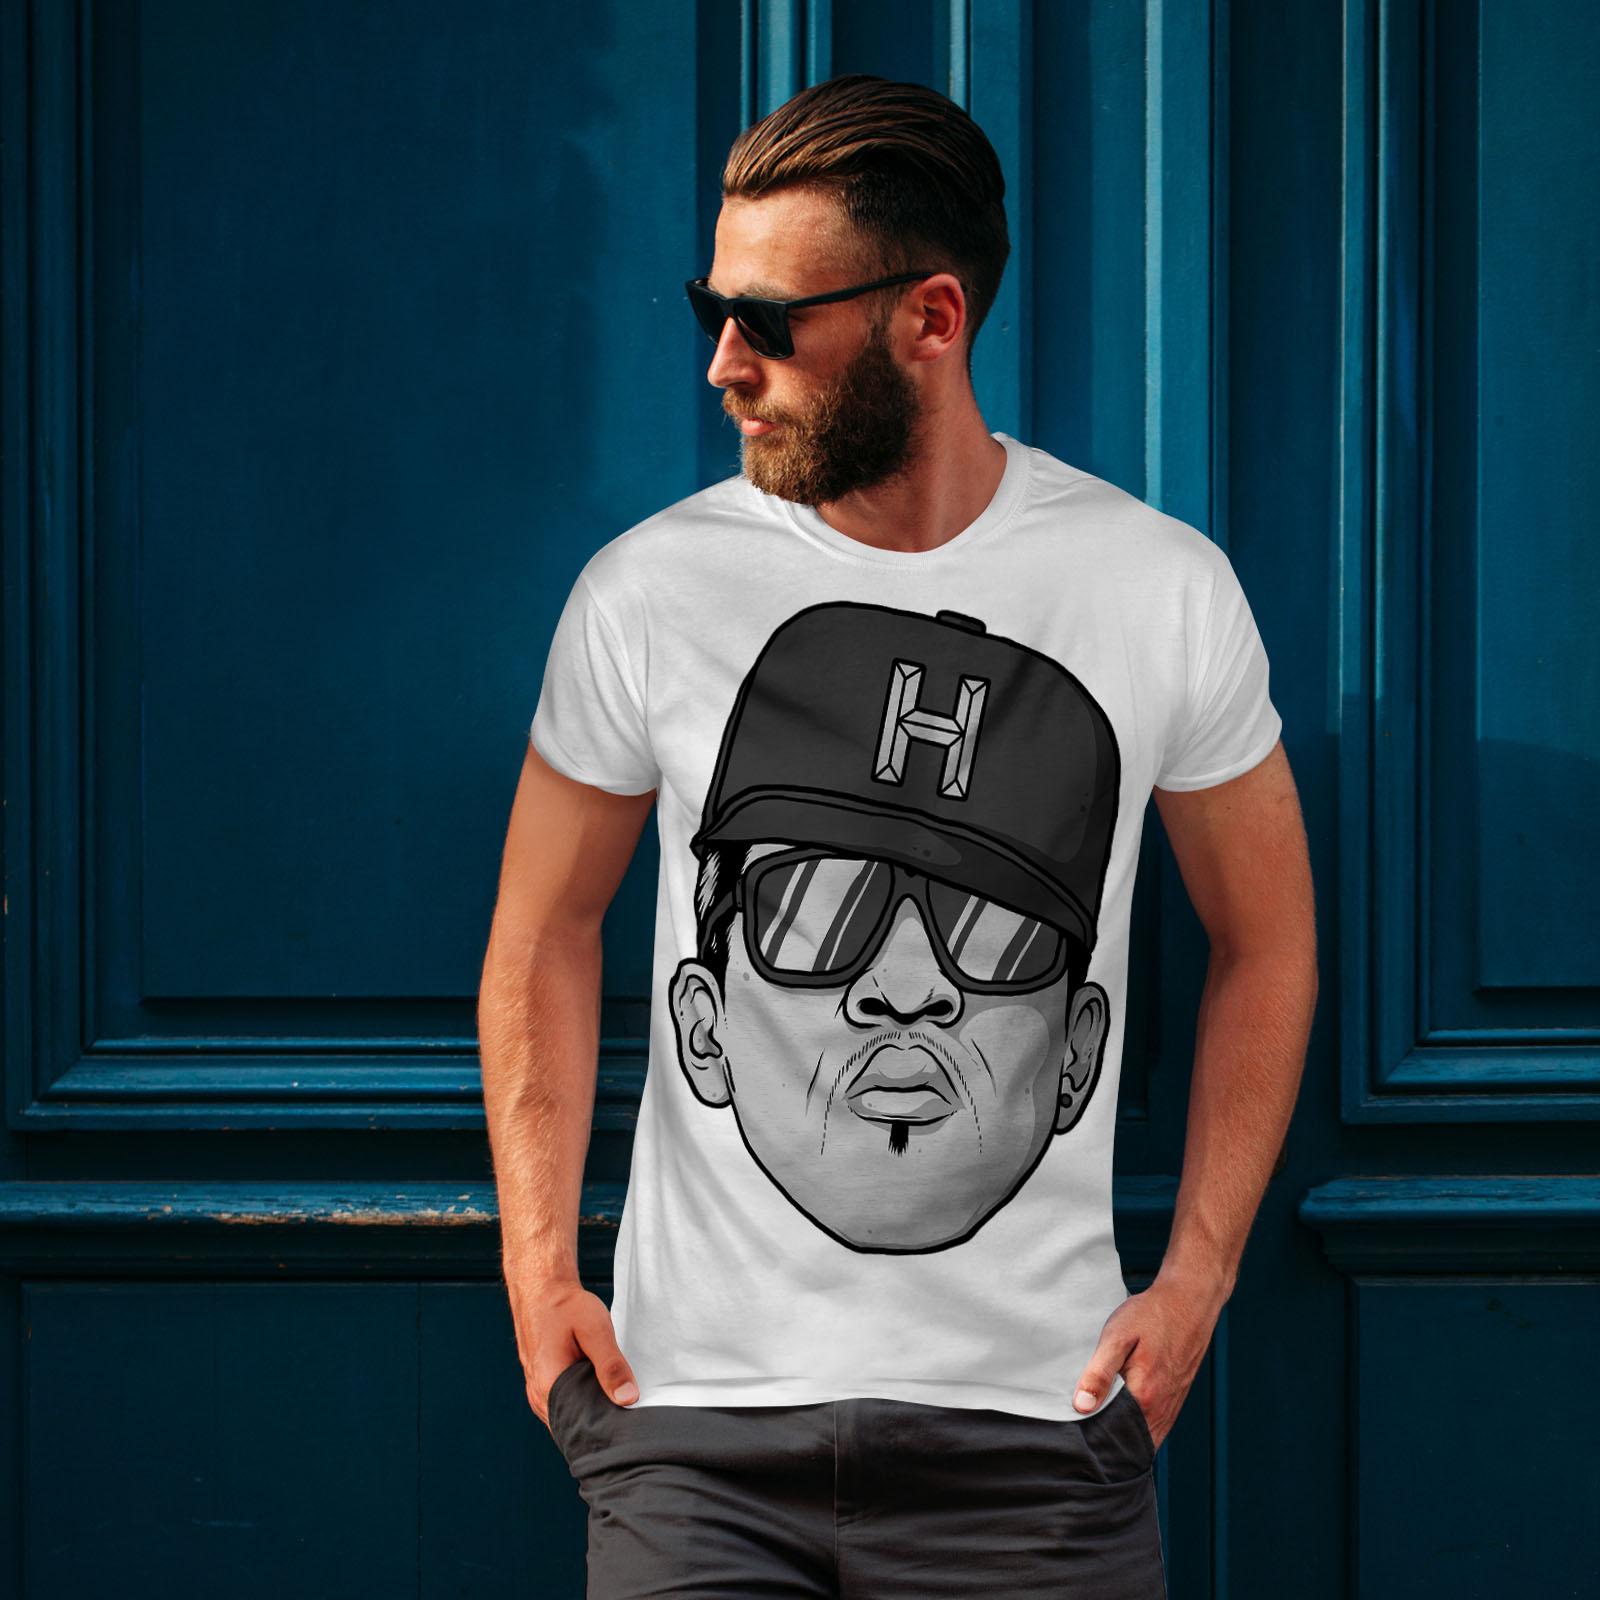 Wellcoda Rapper Gangster Music Mens T-shirt Urban Graphic Design Printed Tee